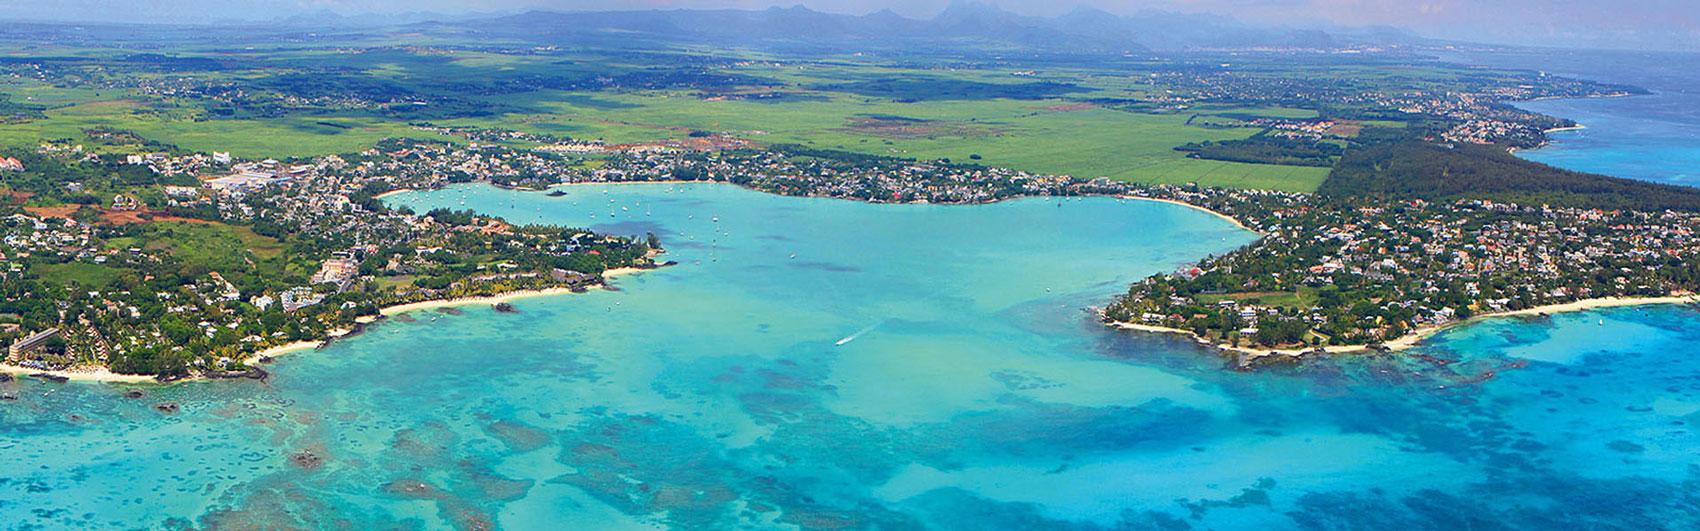 Grand Baie Île Maurice